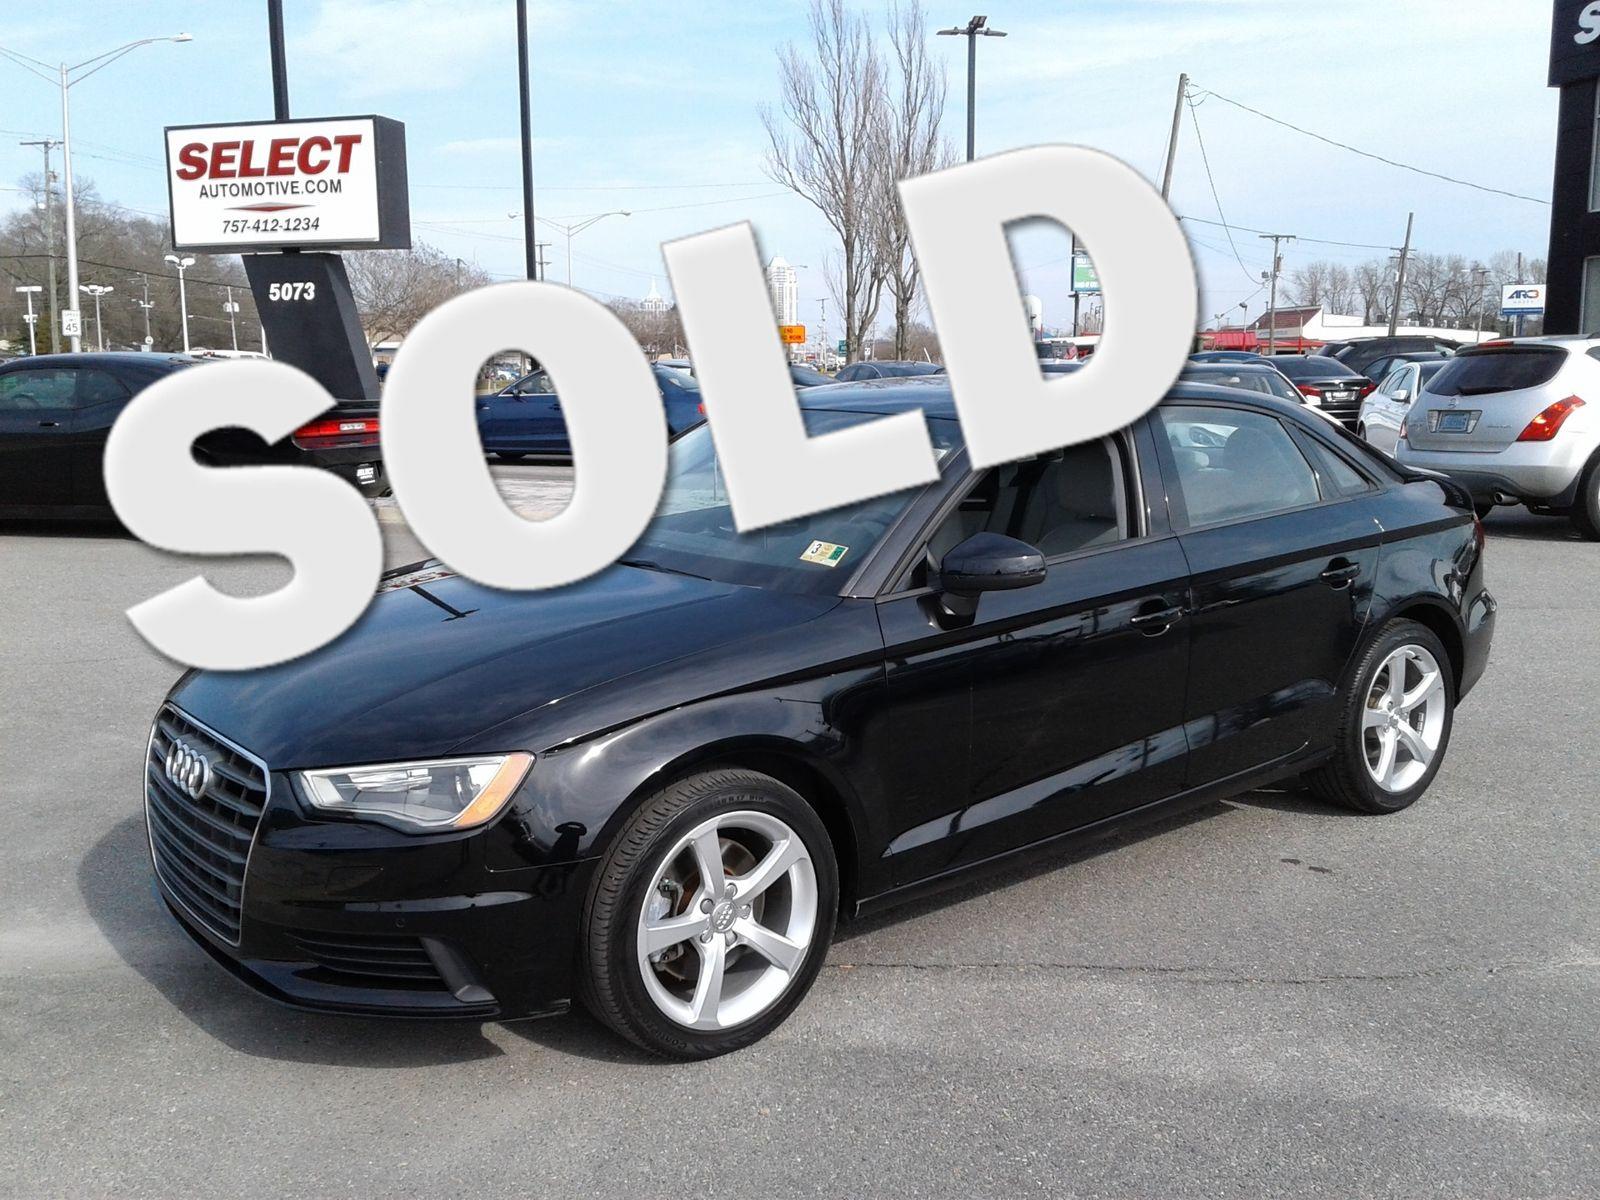 Audi A Premium Turbo City Virginia Select Automotive VA - Audi virginia beach